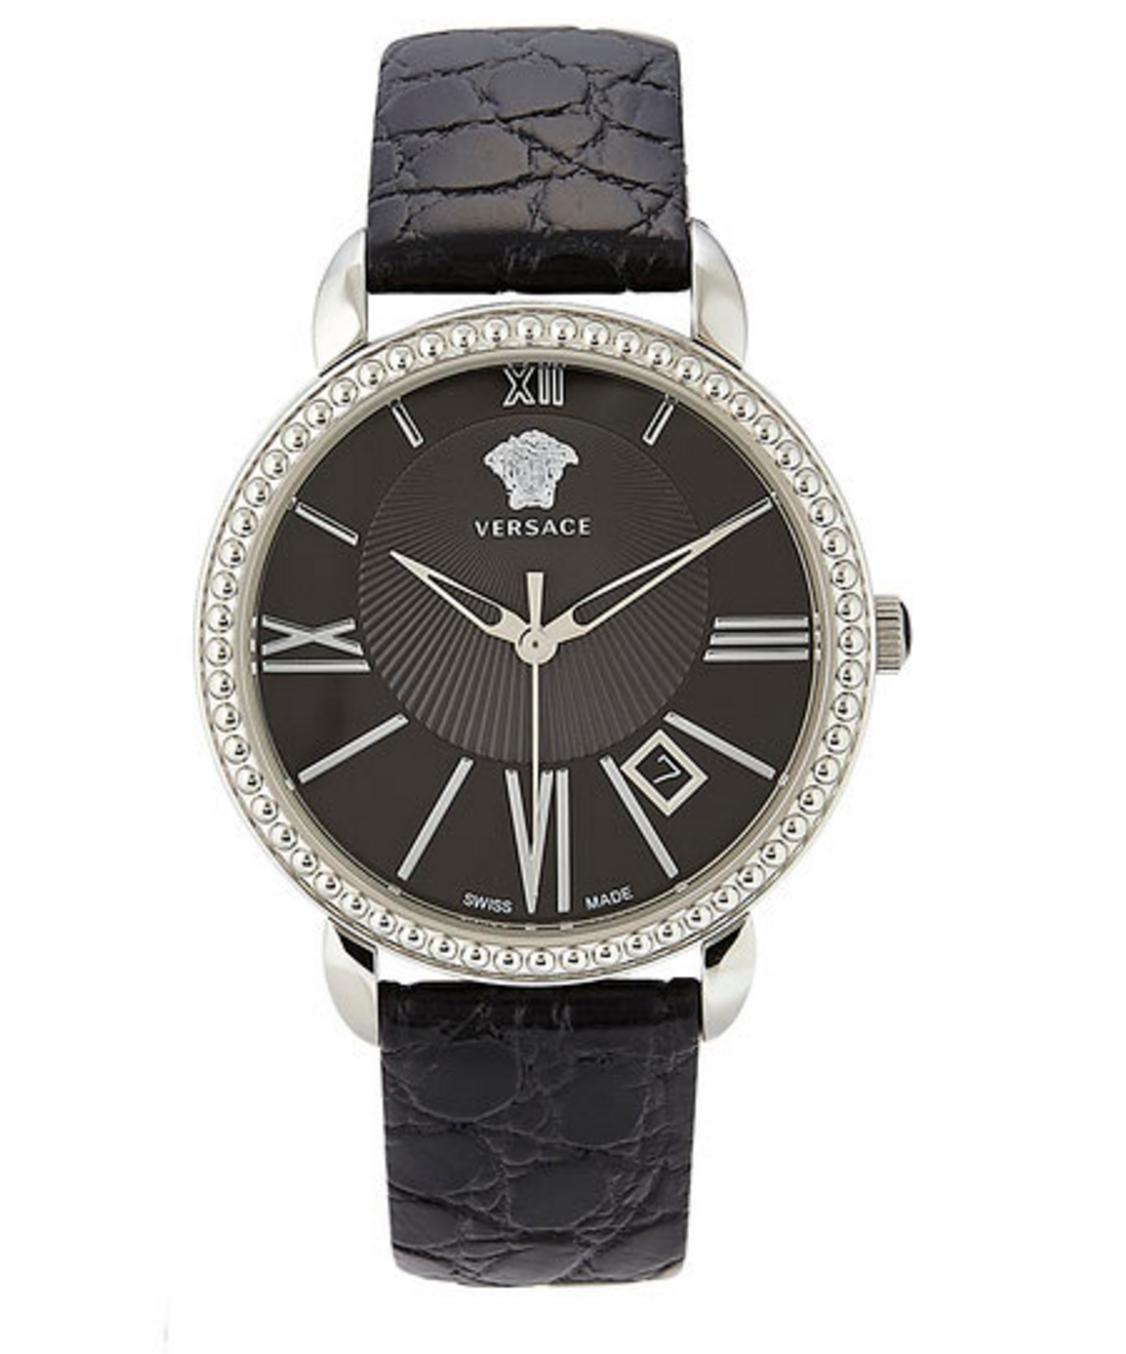 Versace Silver-Tone & Black Watch